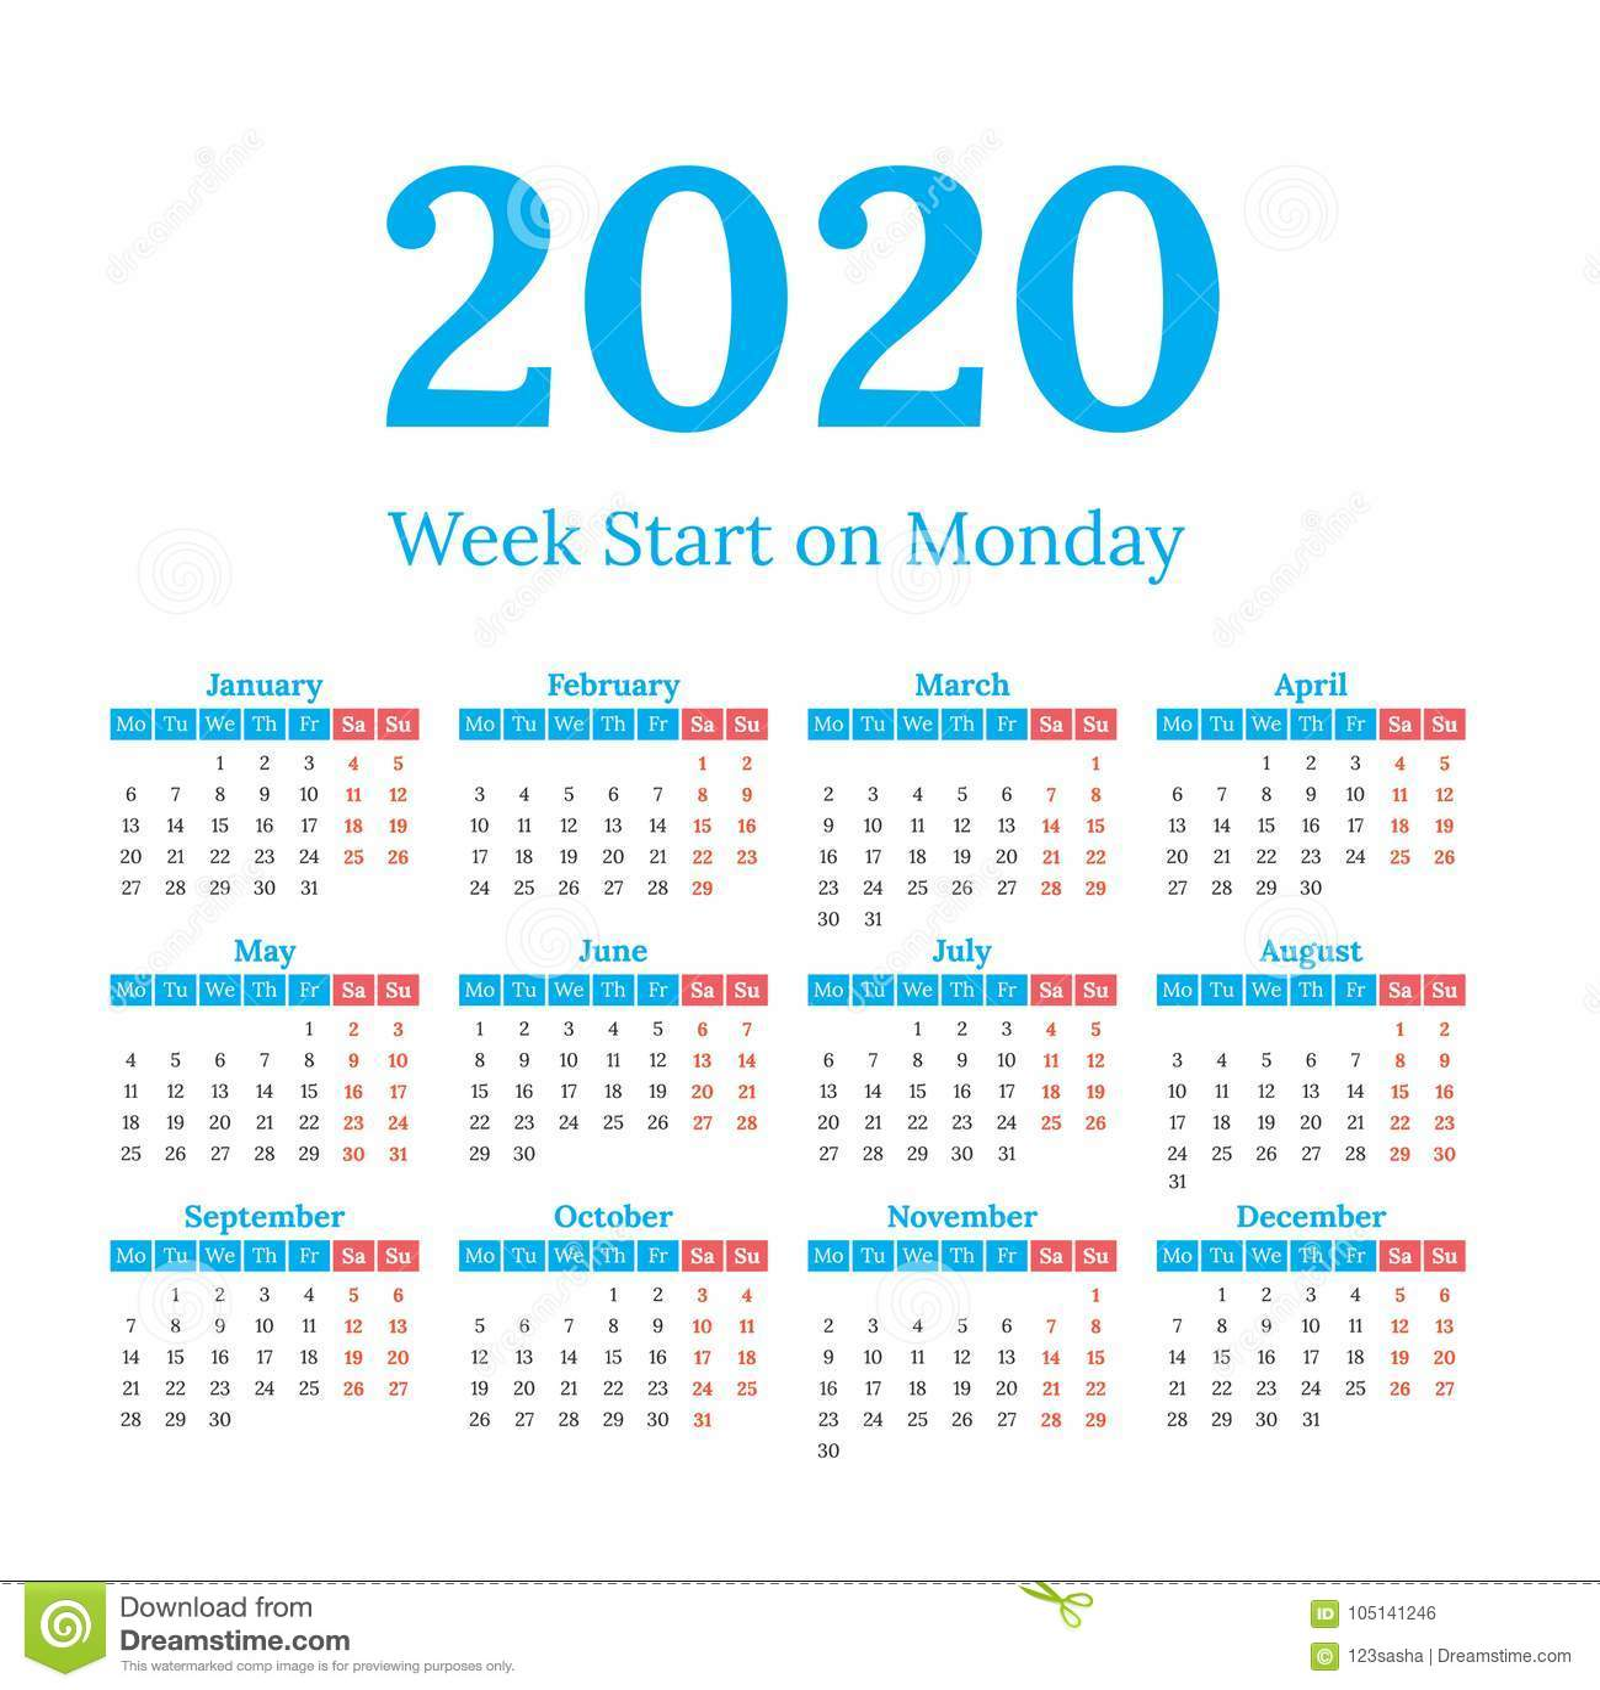 5 Year Calendar Starting 2020 2020 Calendar Start On Monday Stock Vector   Illustration of